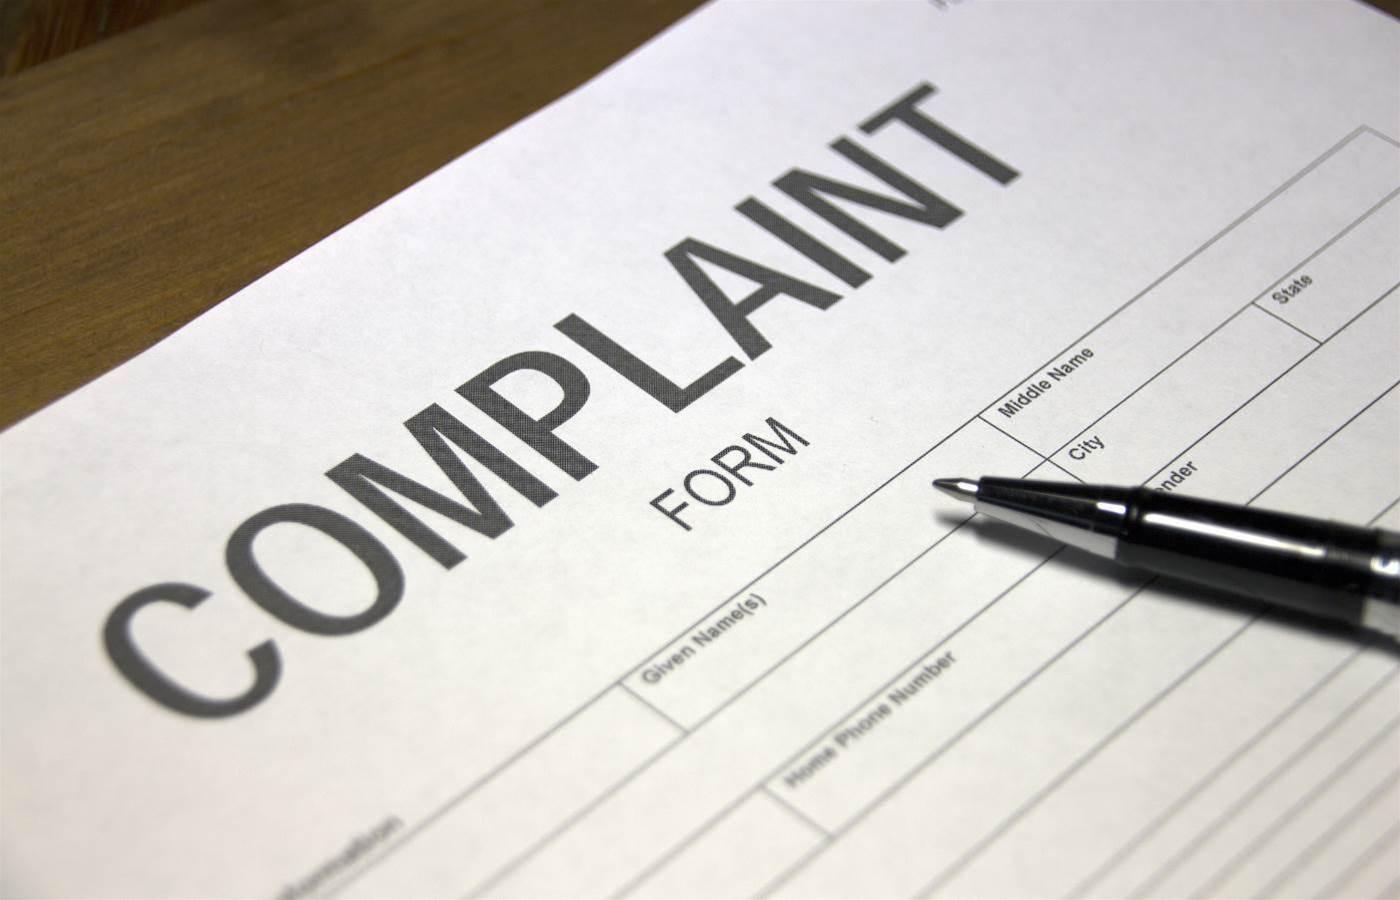 Telcos fail complaint-handling audit: ACMA